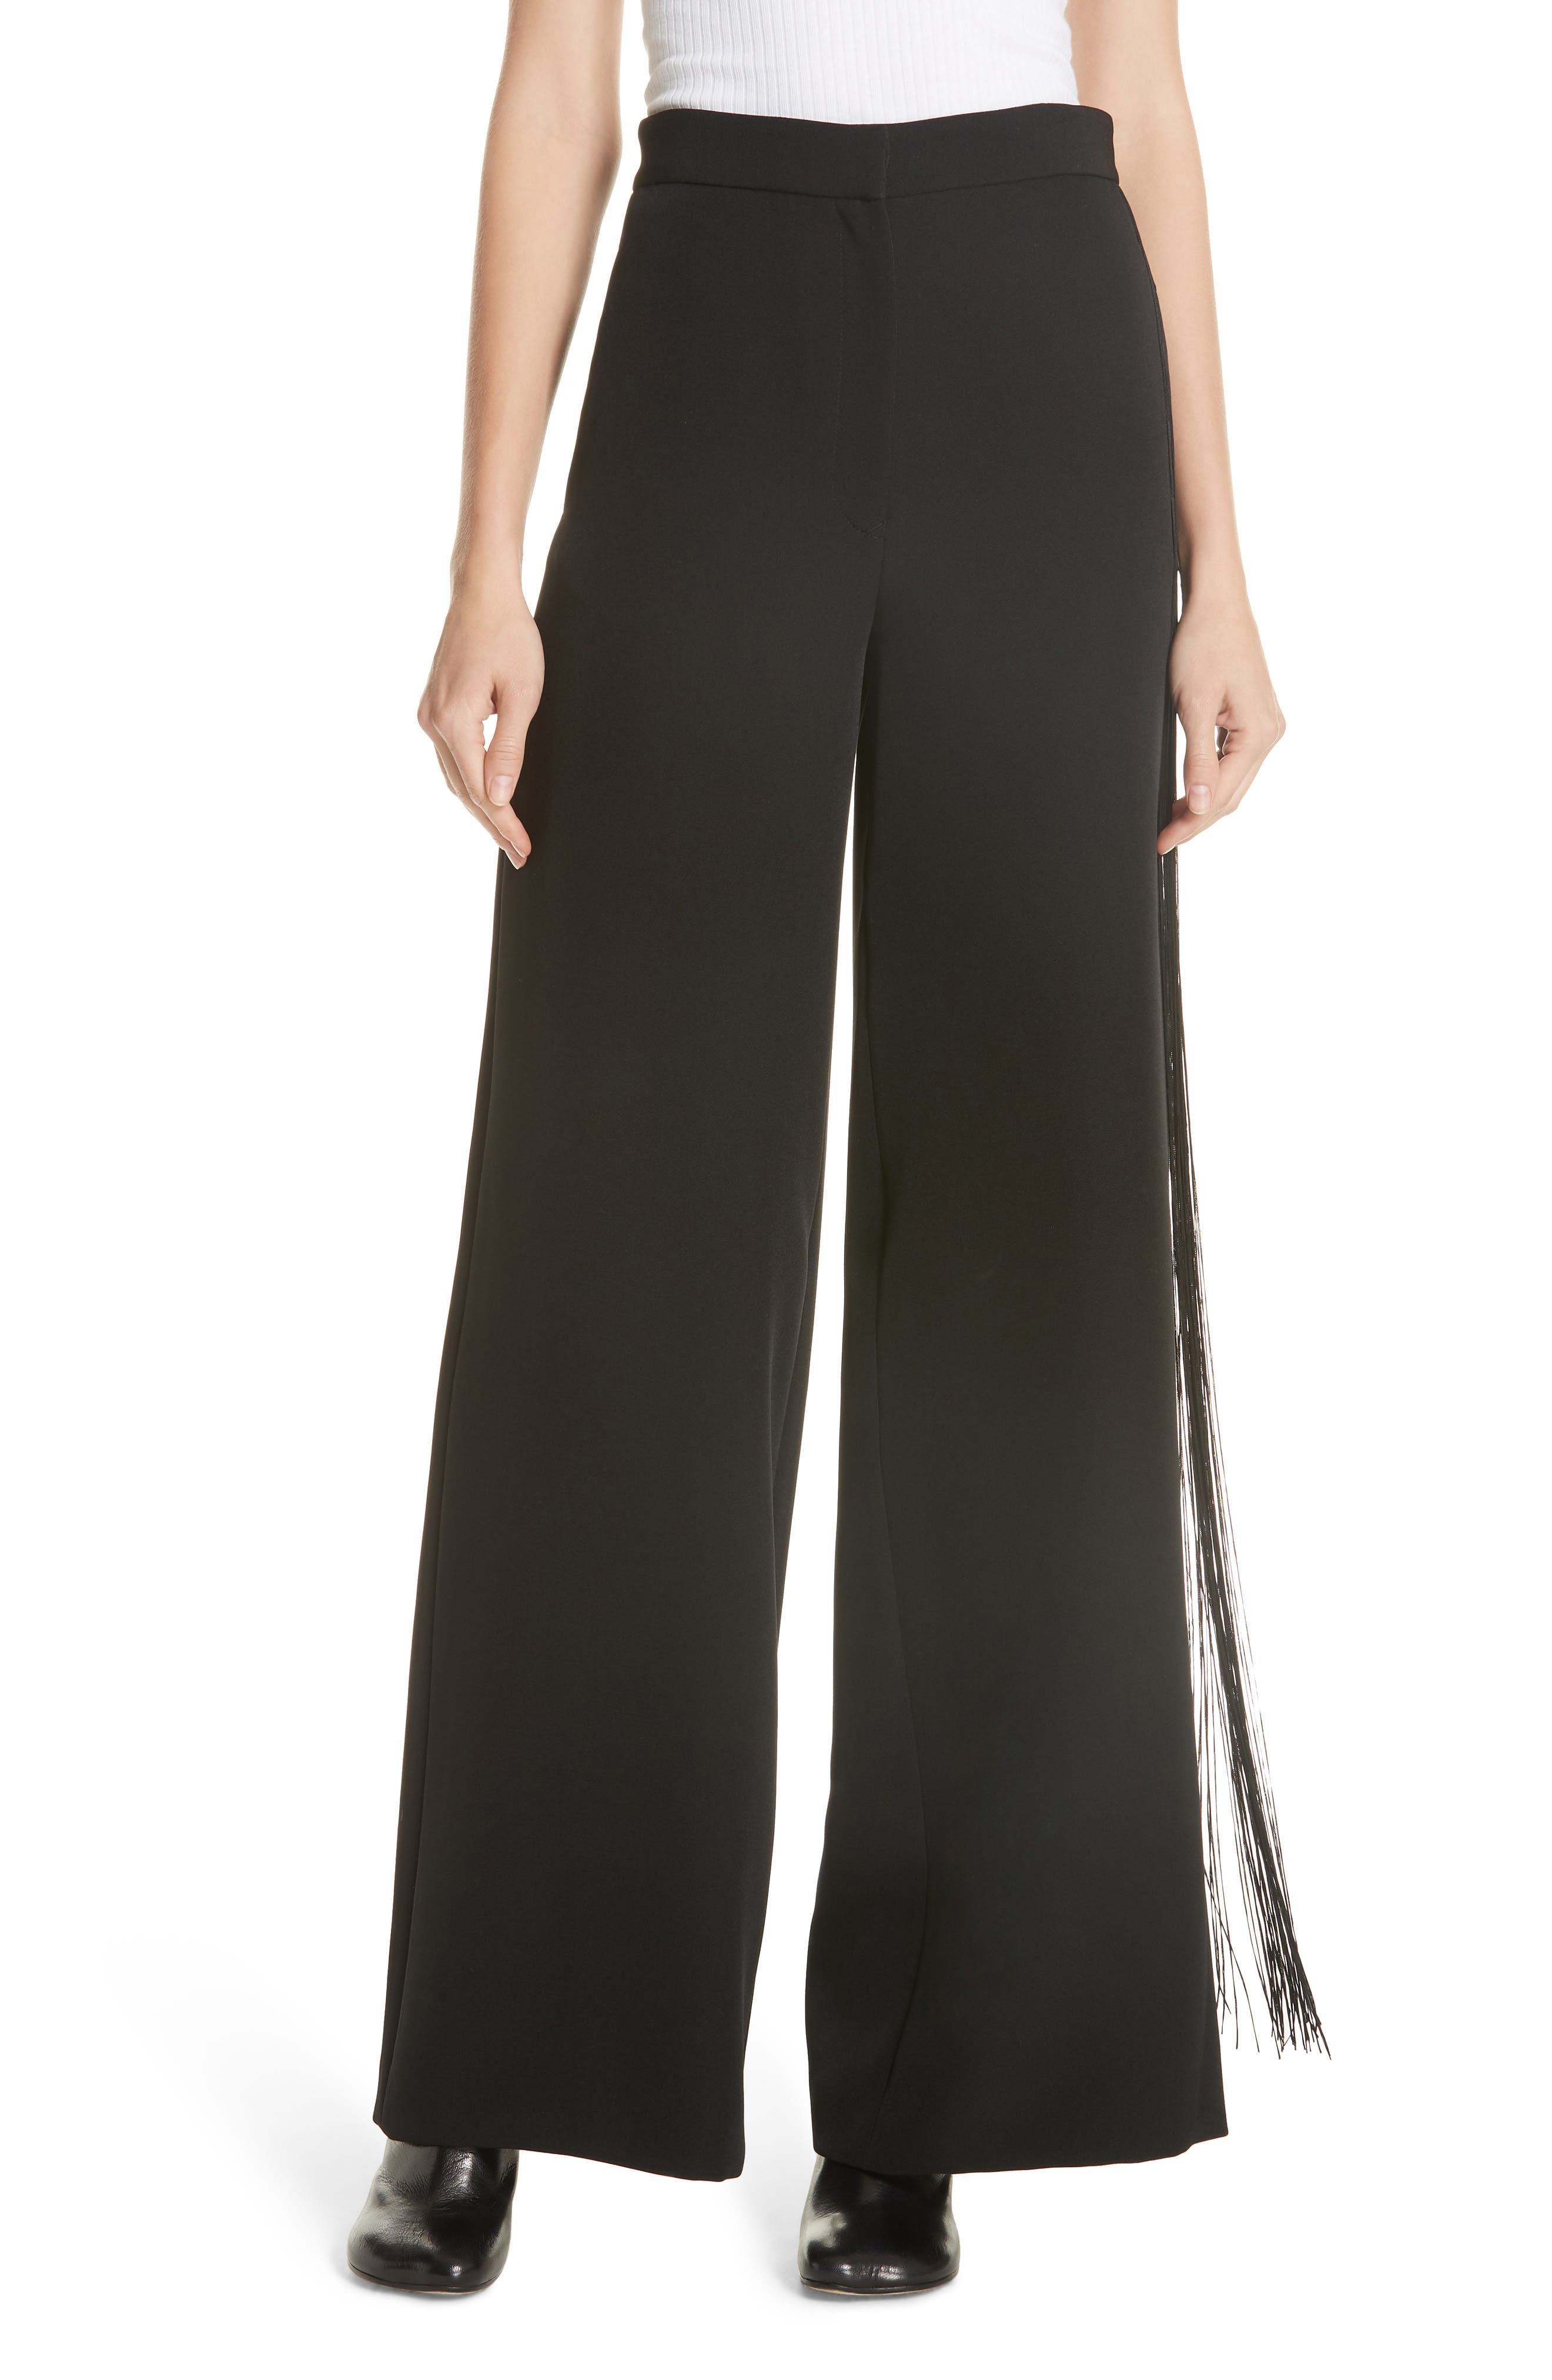 Fringe Detail Pants in Black